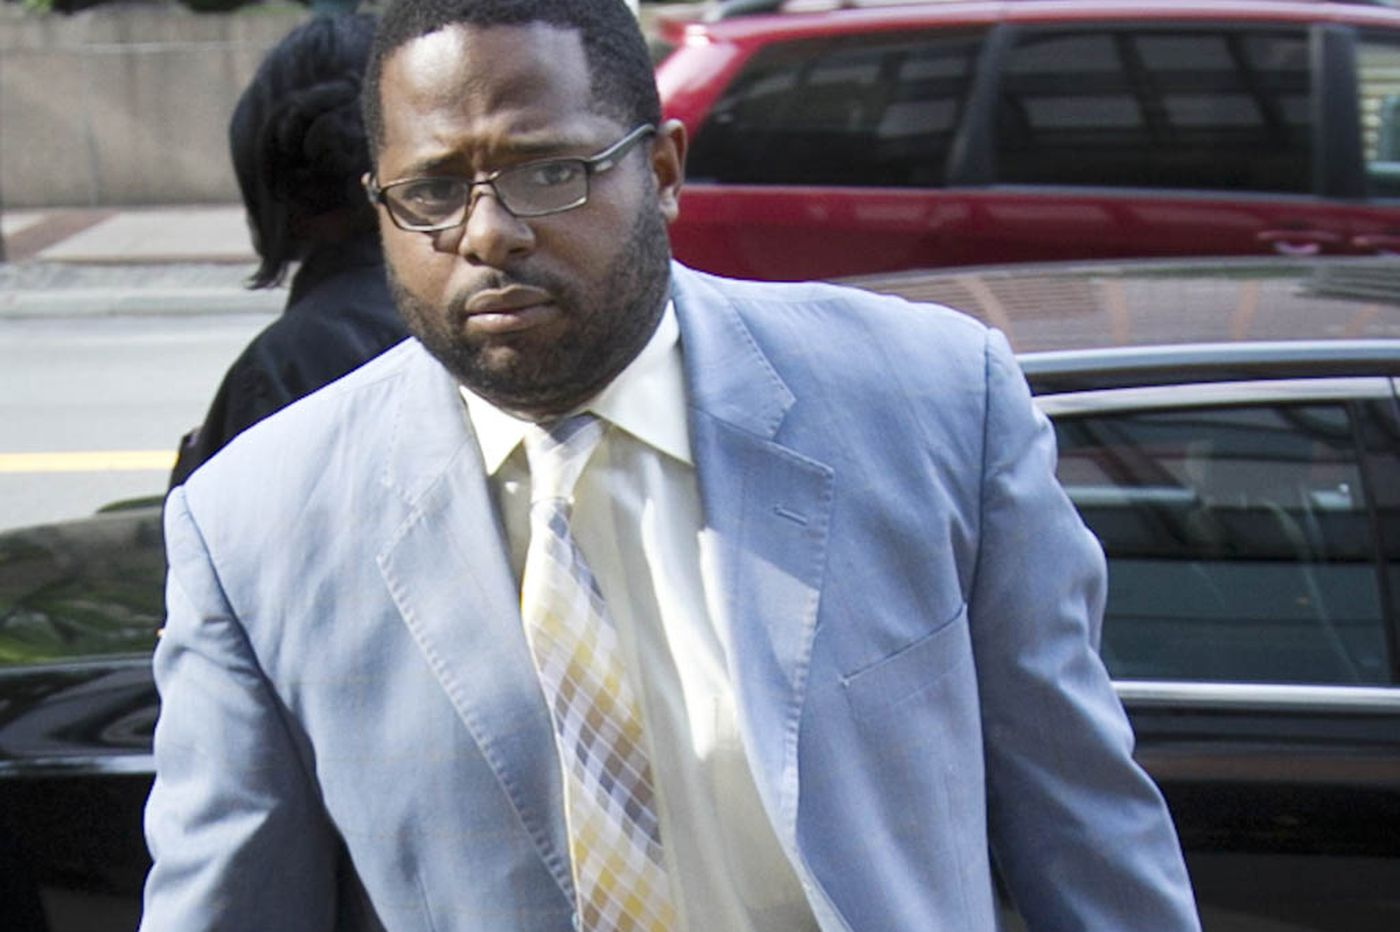 Former Traffic Court judge Singletary gets 20 months